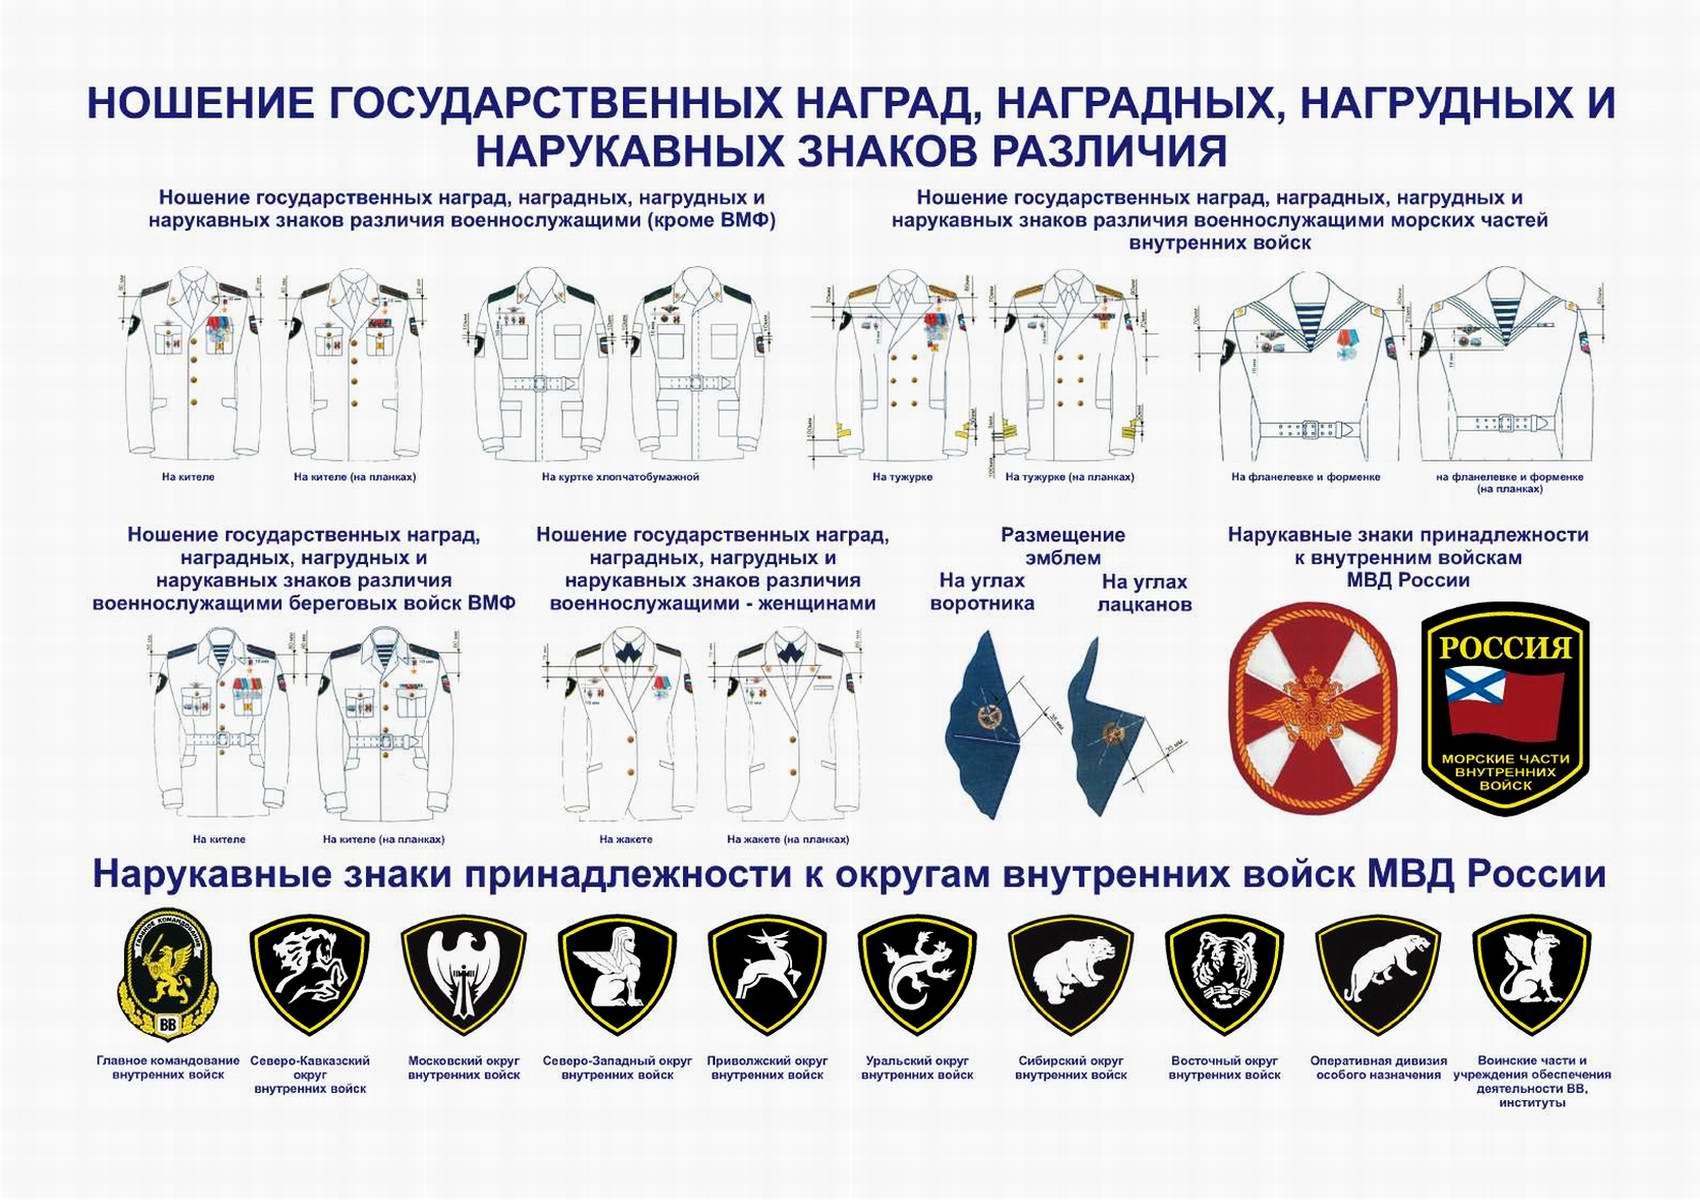 https://forma-odezhda.ru/image/data/wp-content/uploads/2016/02/raspolozhenie_nagrad.jpg